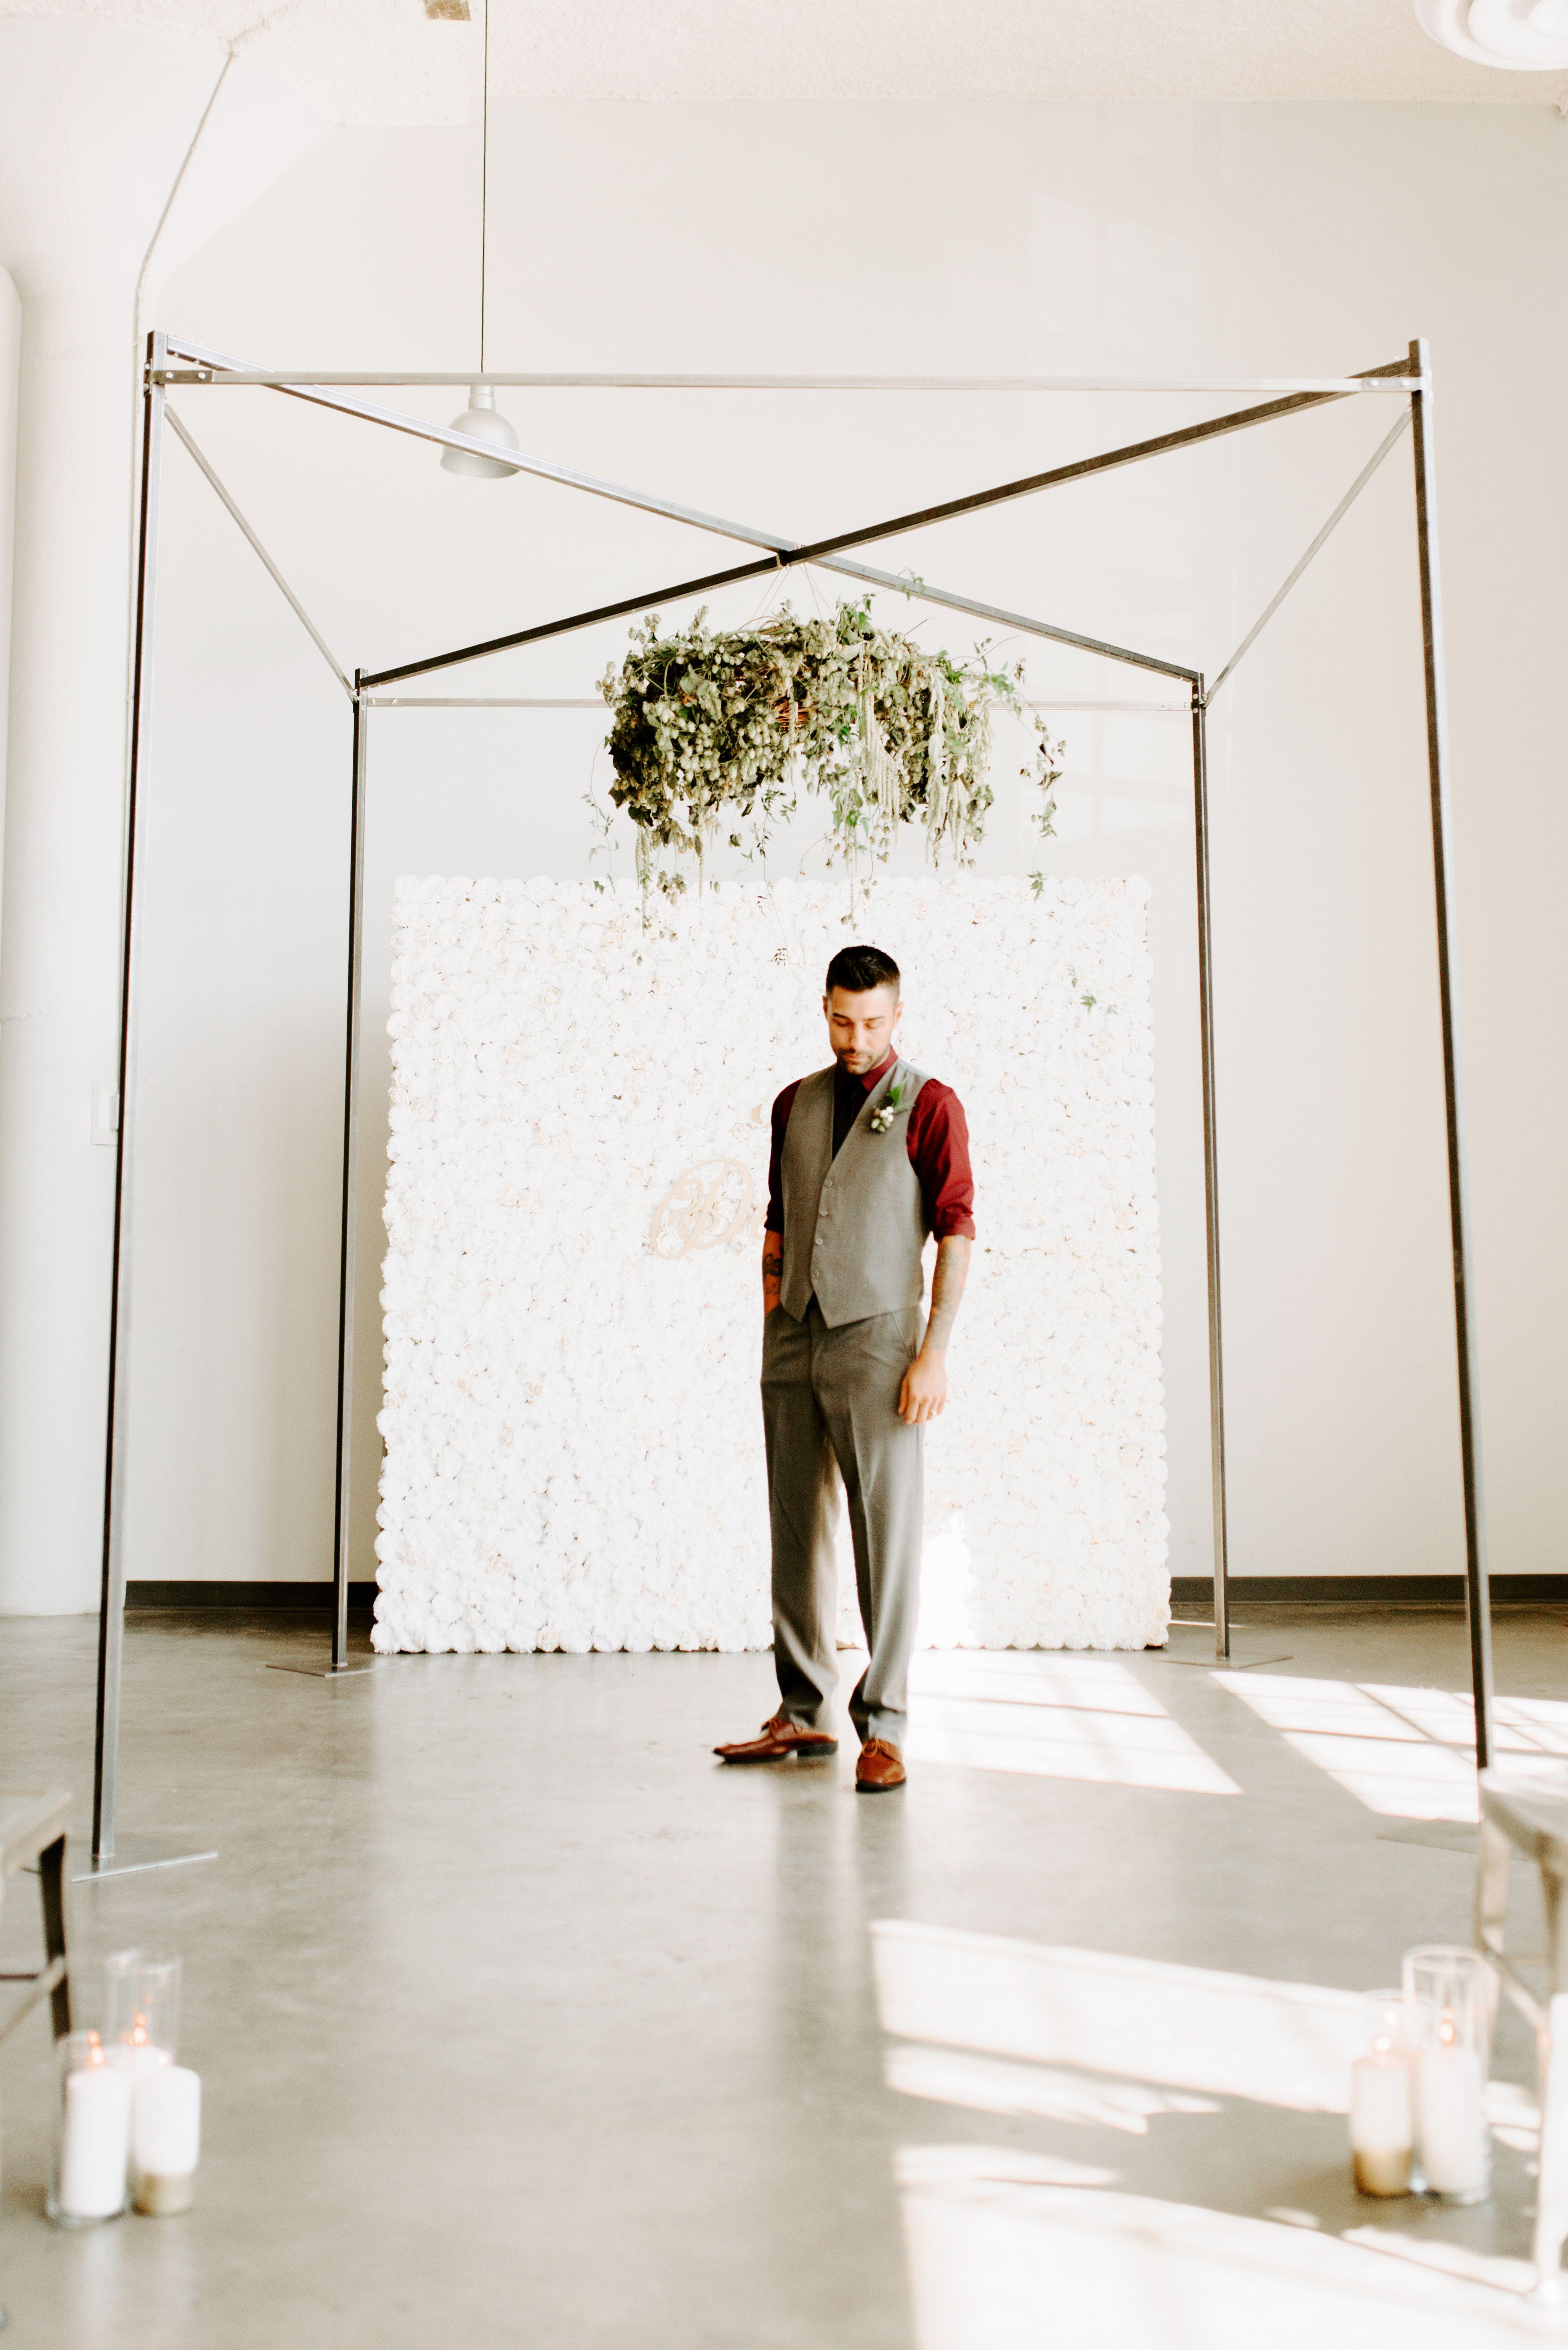 Men S Suit Tuxedo Rentals Wedding Shoppe Father Of The Bride Outfit Wedding Inspiration Fall Wedding Shoppe